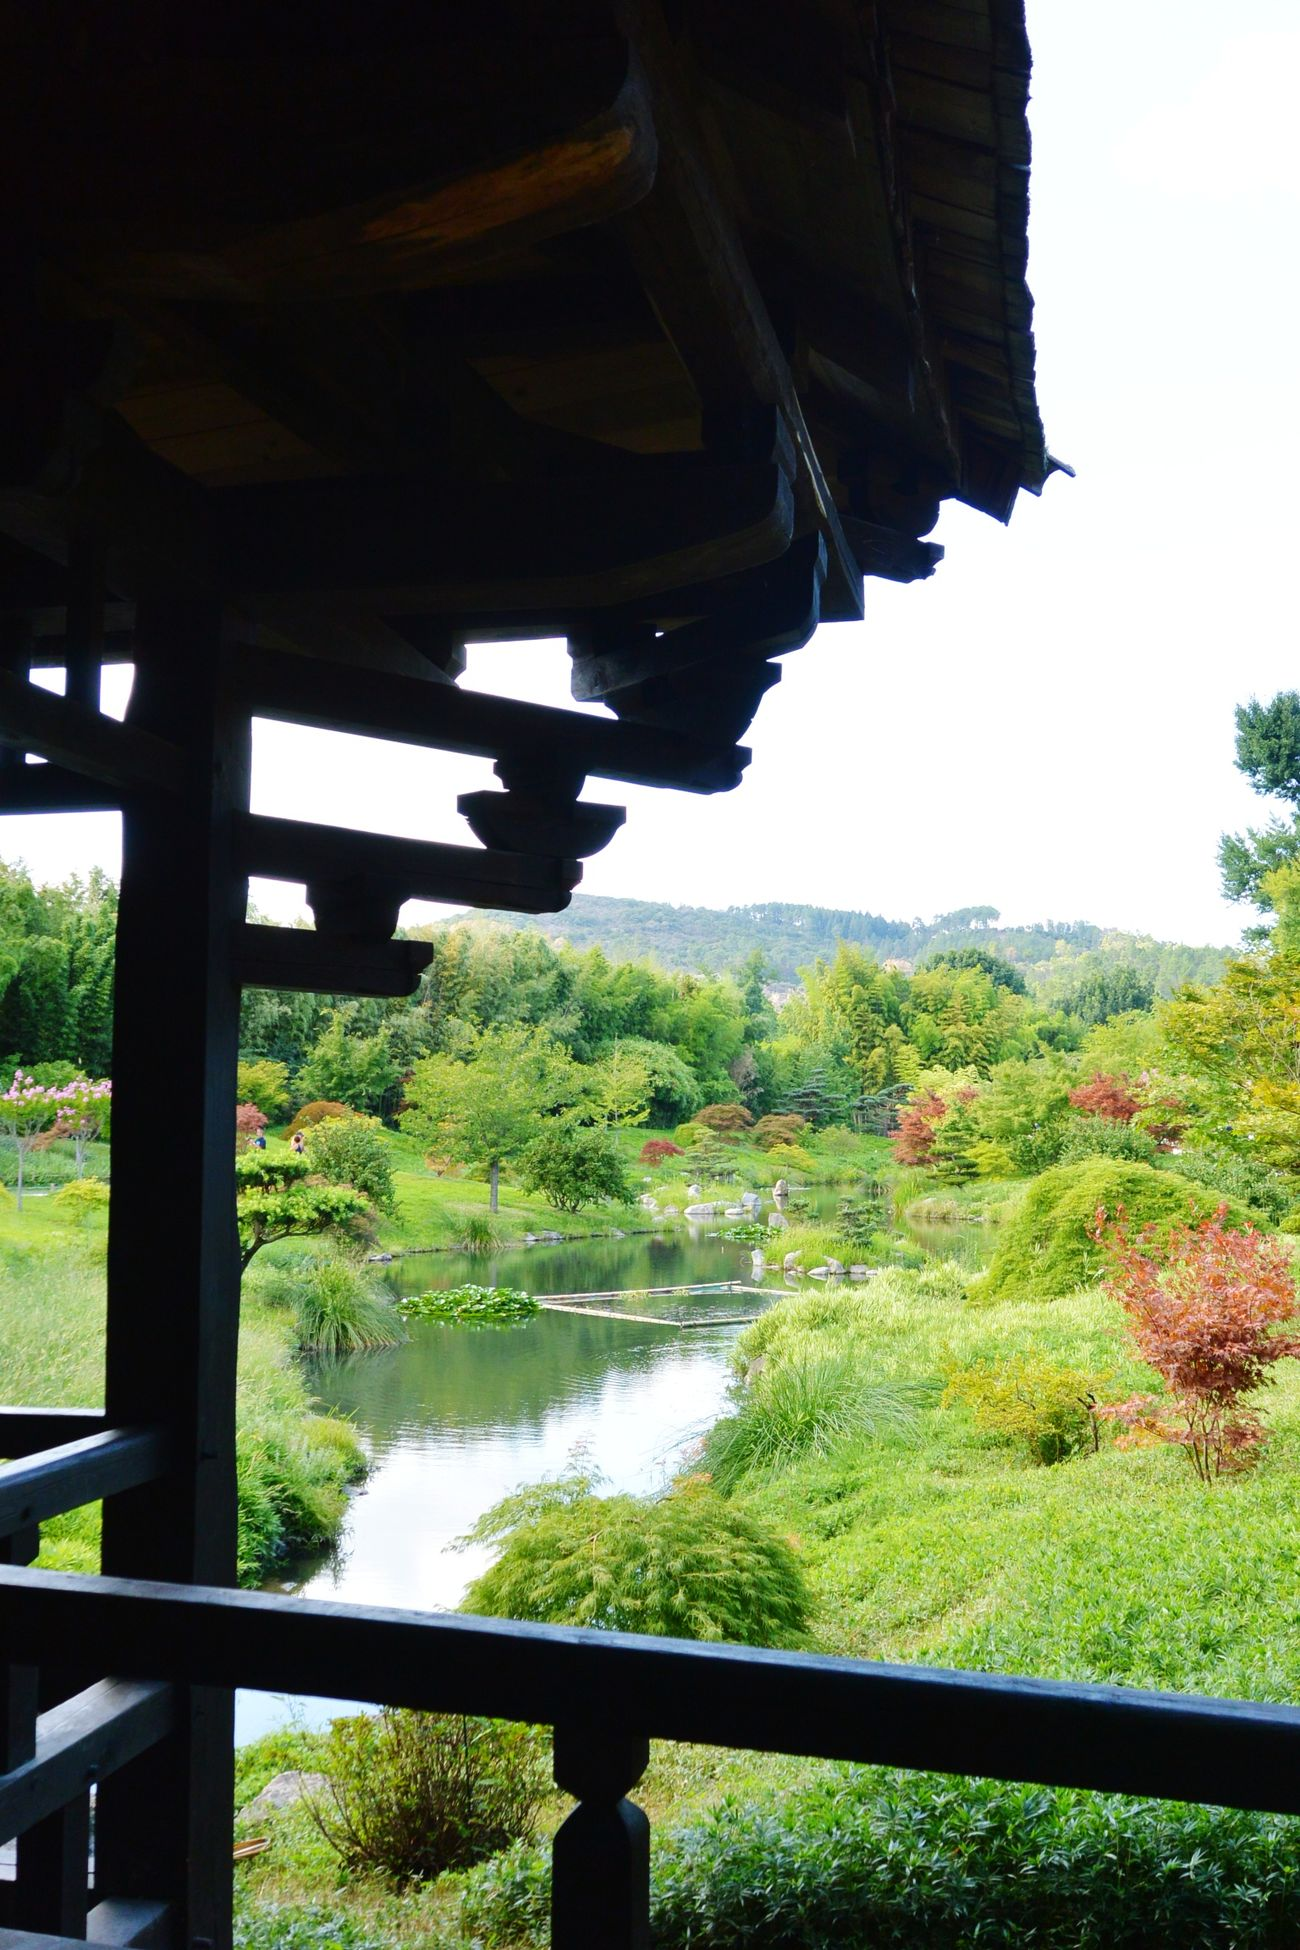 Balcon sur le jardin zen Asian Garden Zen Pagoda La Bambouseraie Anduze Holiday Memories South France